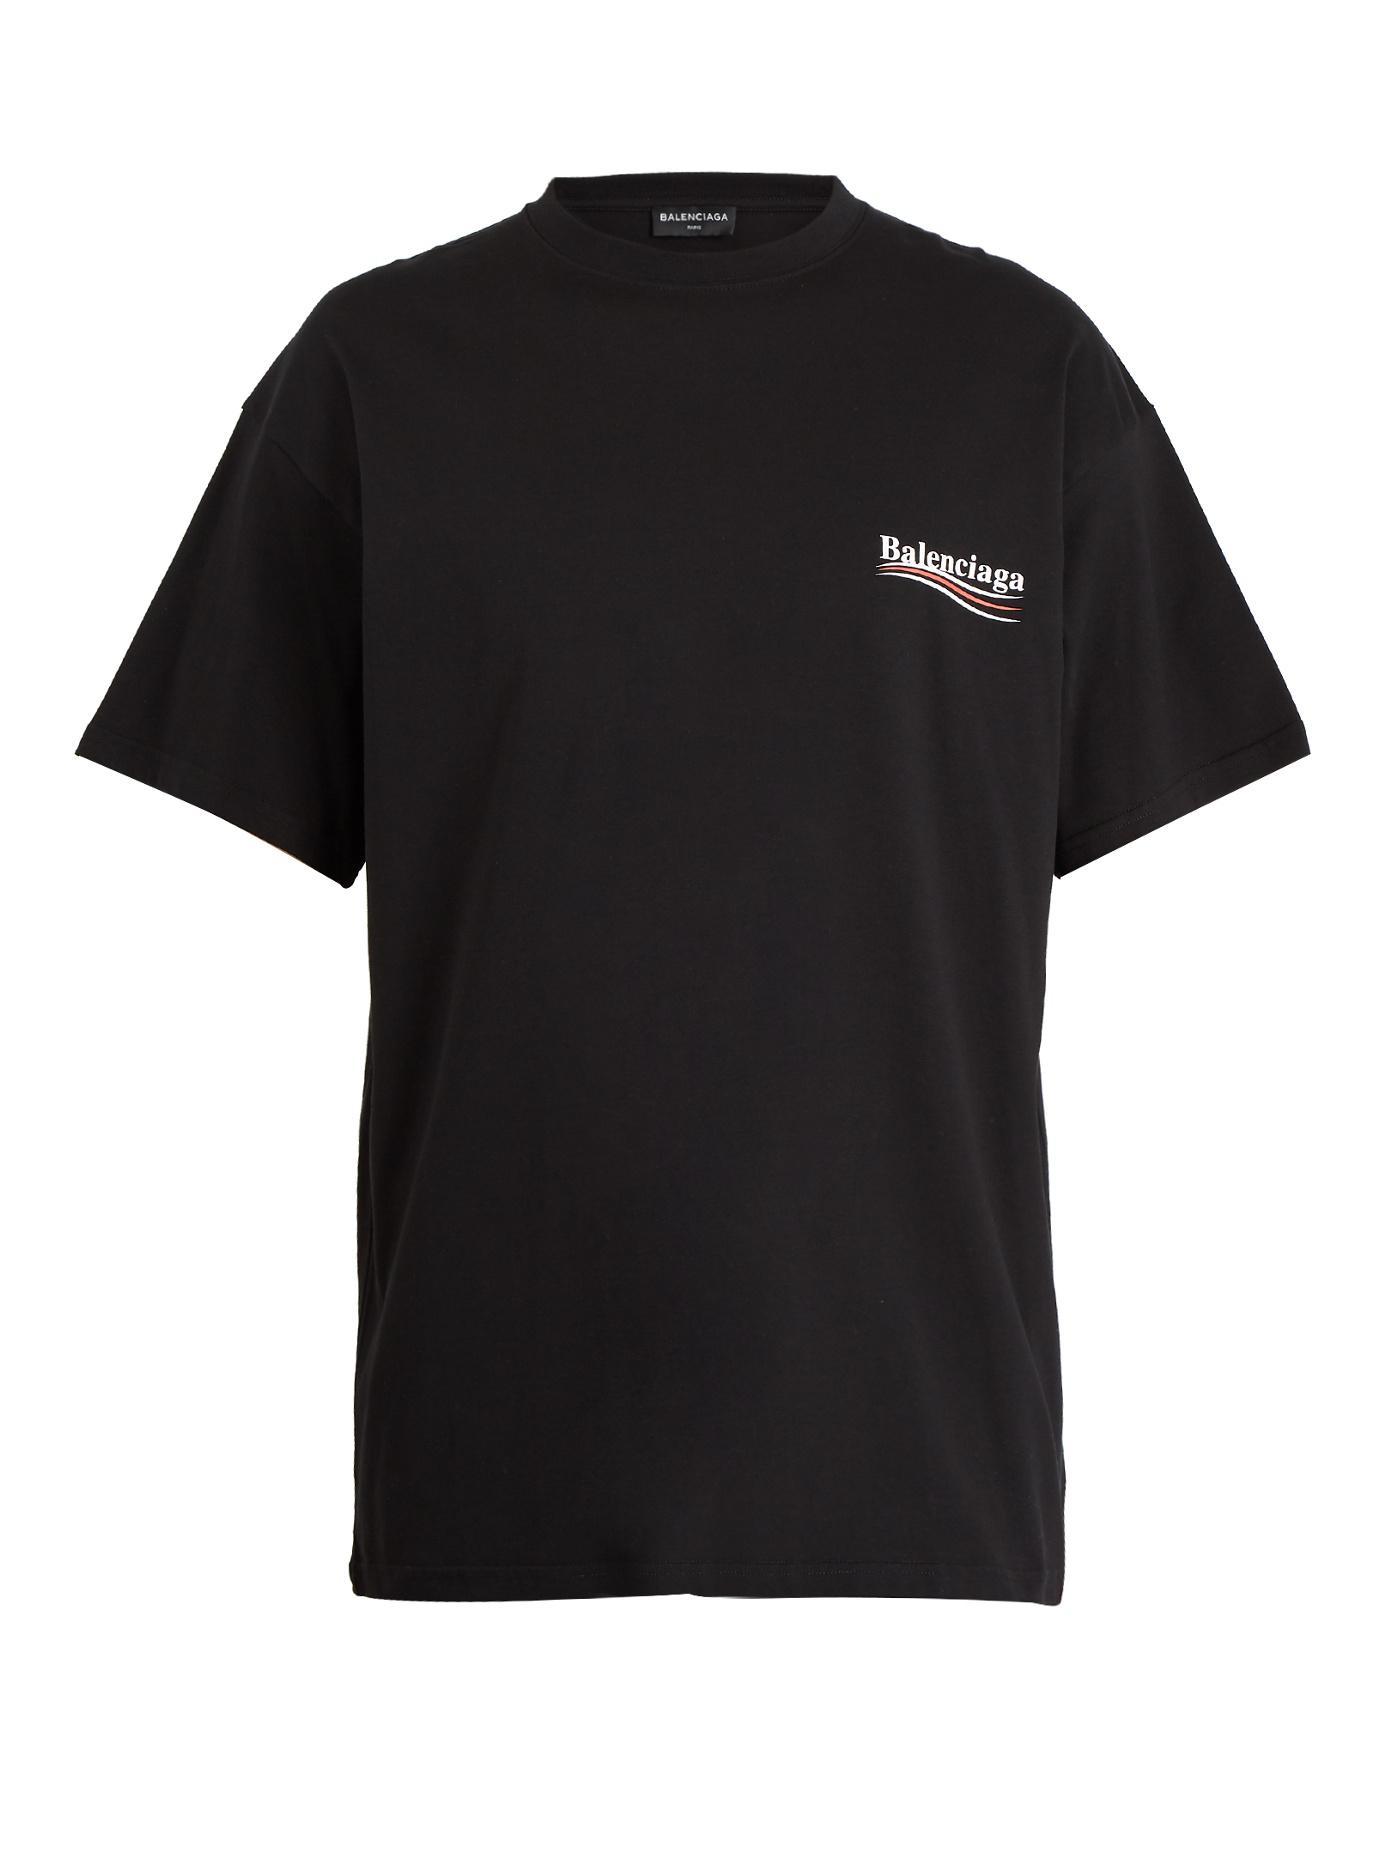 Lyst Balenciaga Logo Print Cotton Jersey T Shirt In